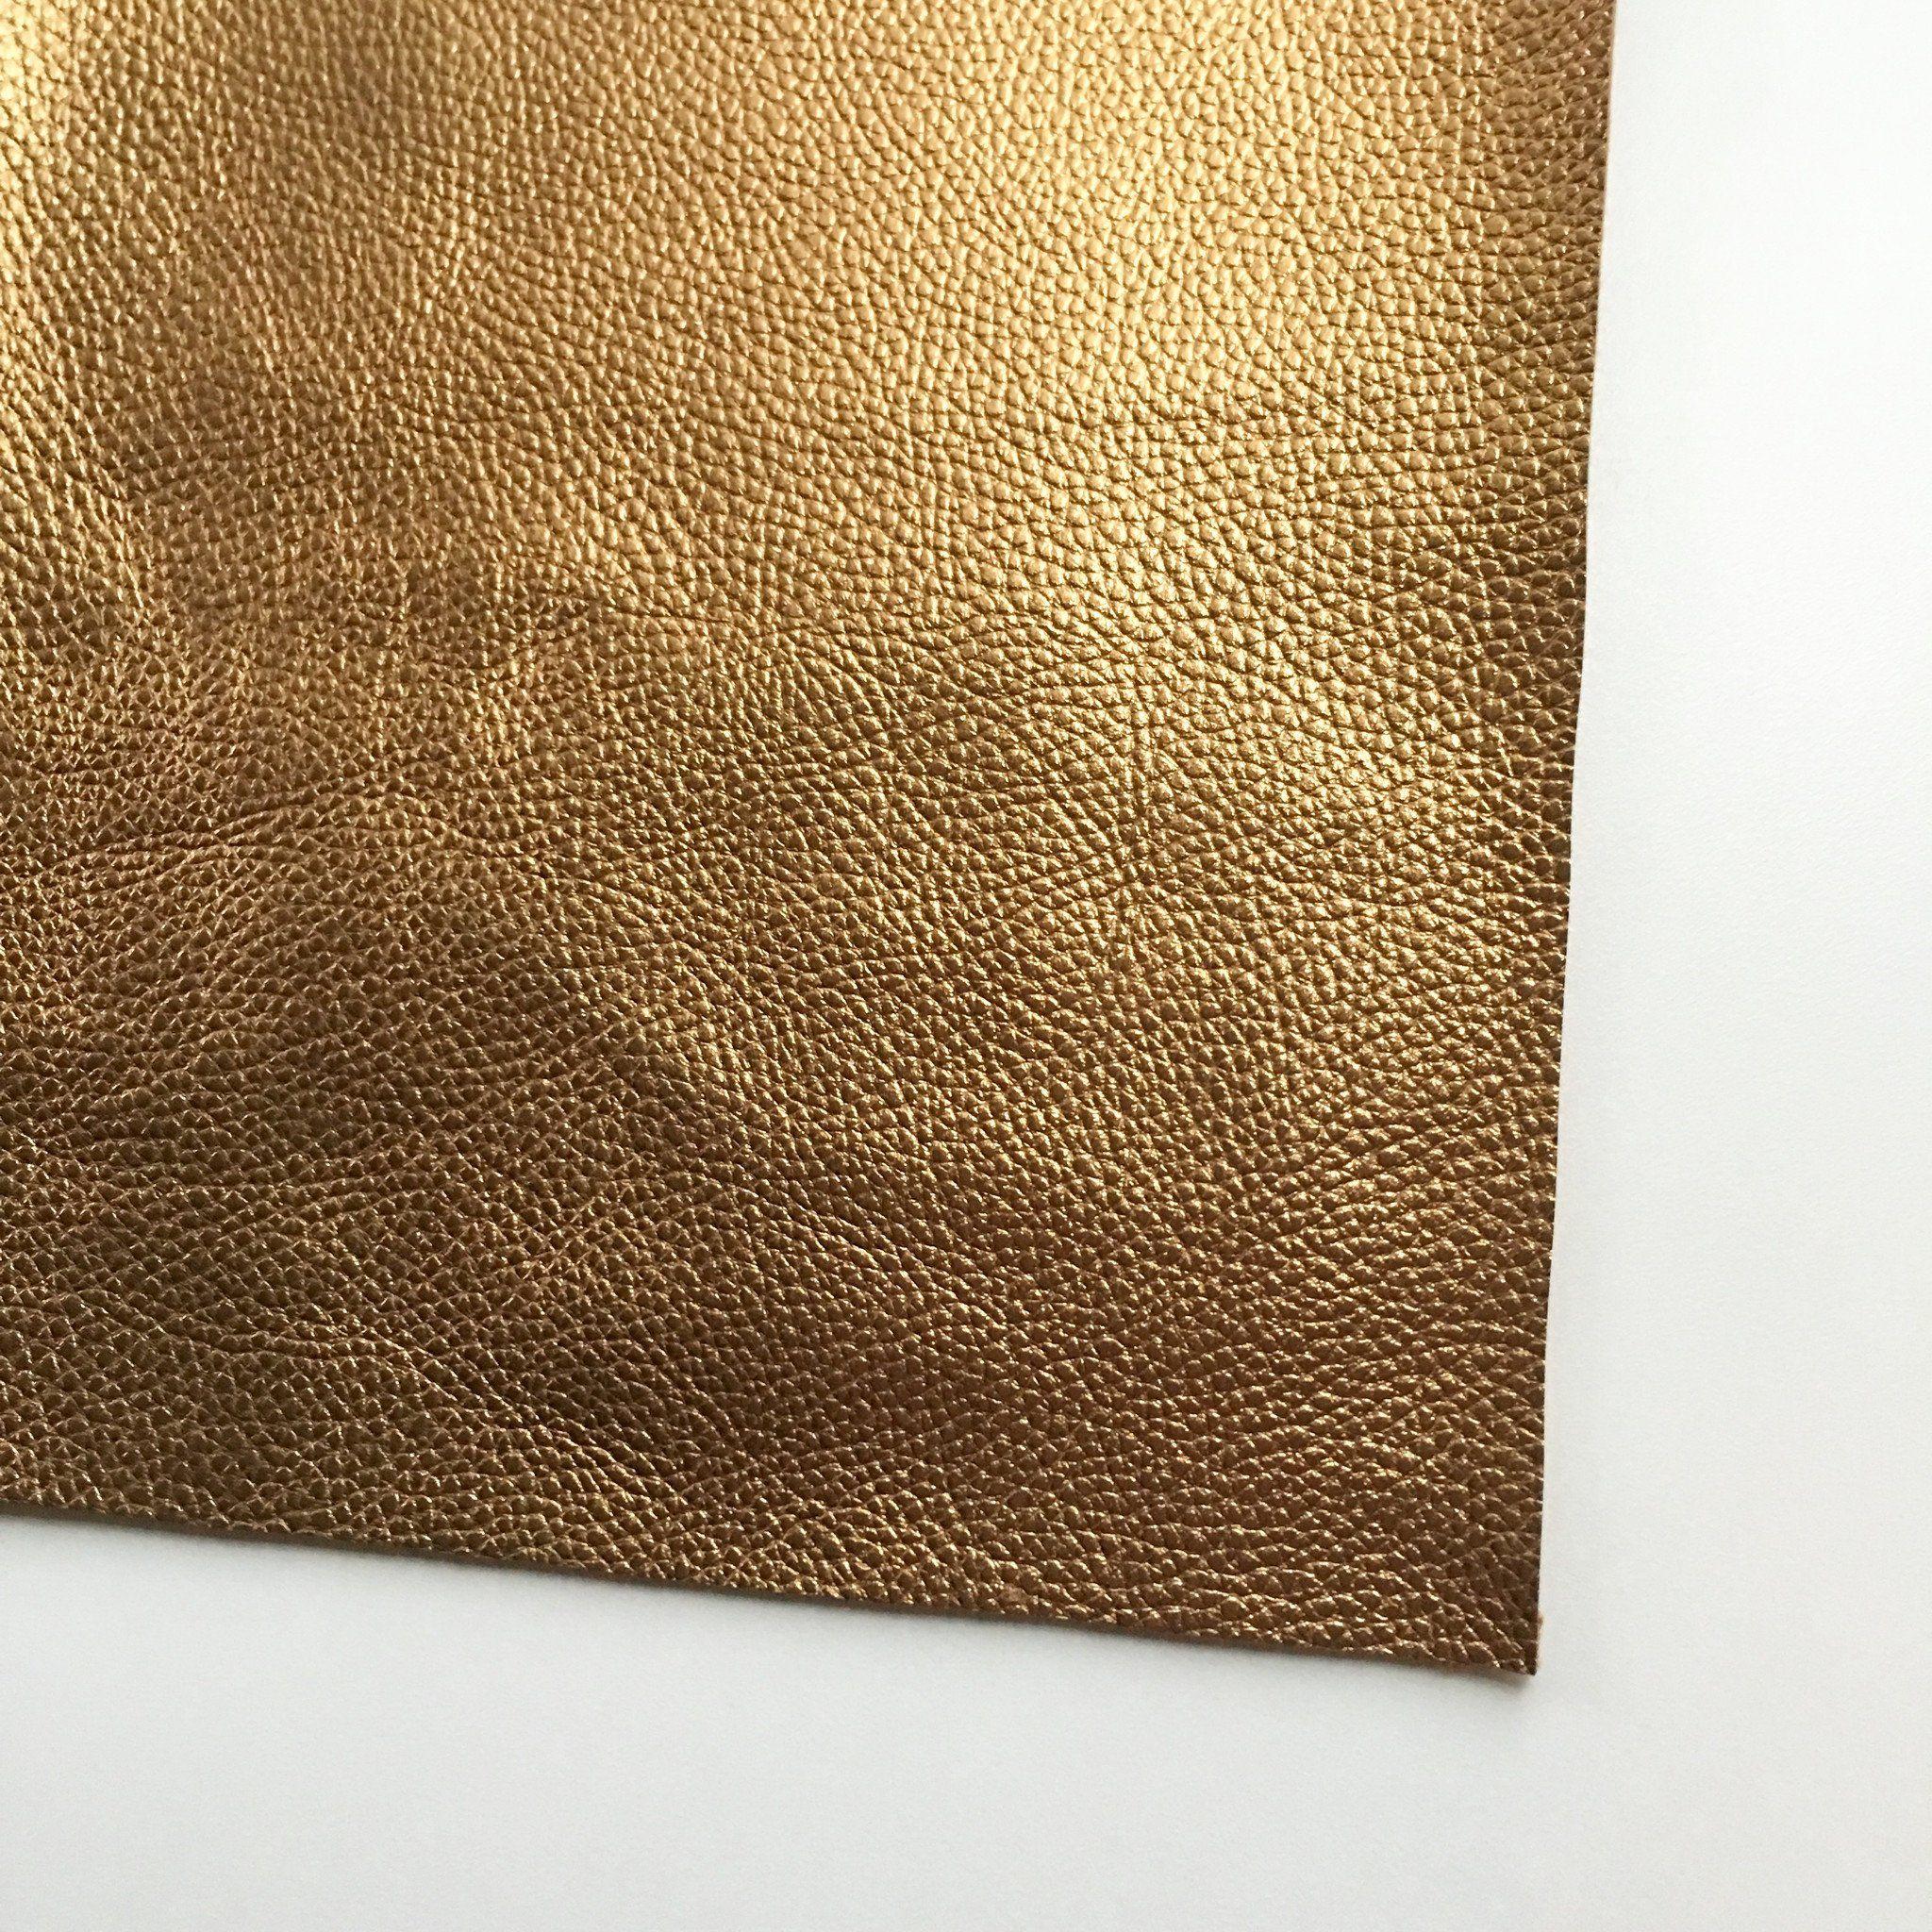 Metallic Foil Copper Textured Faux Leather